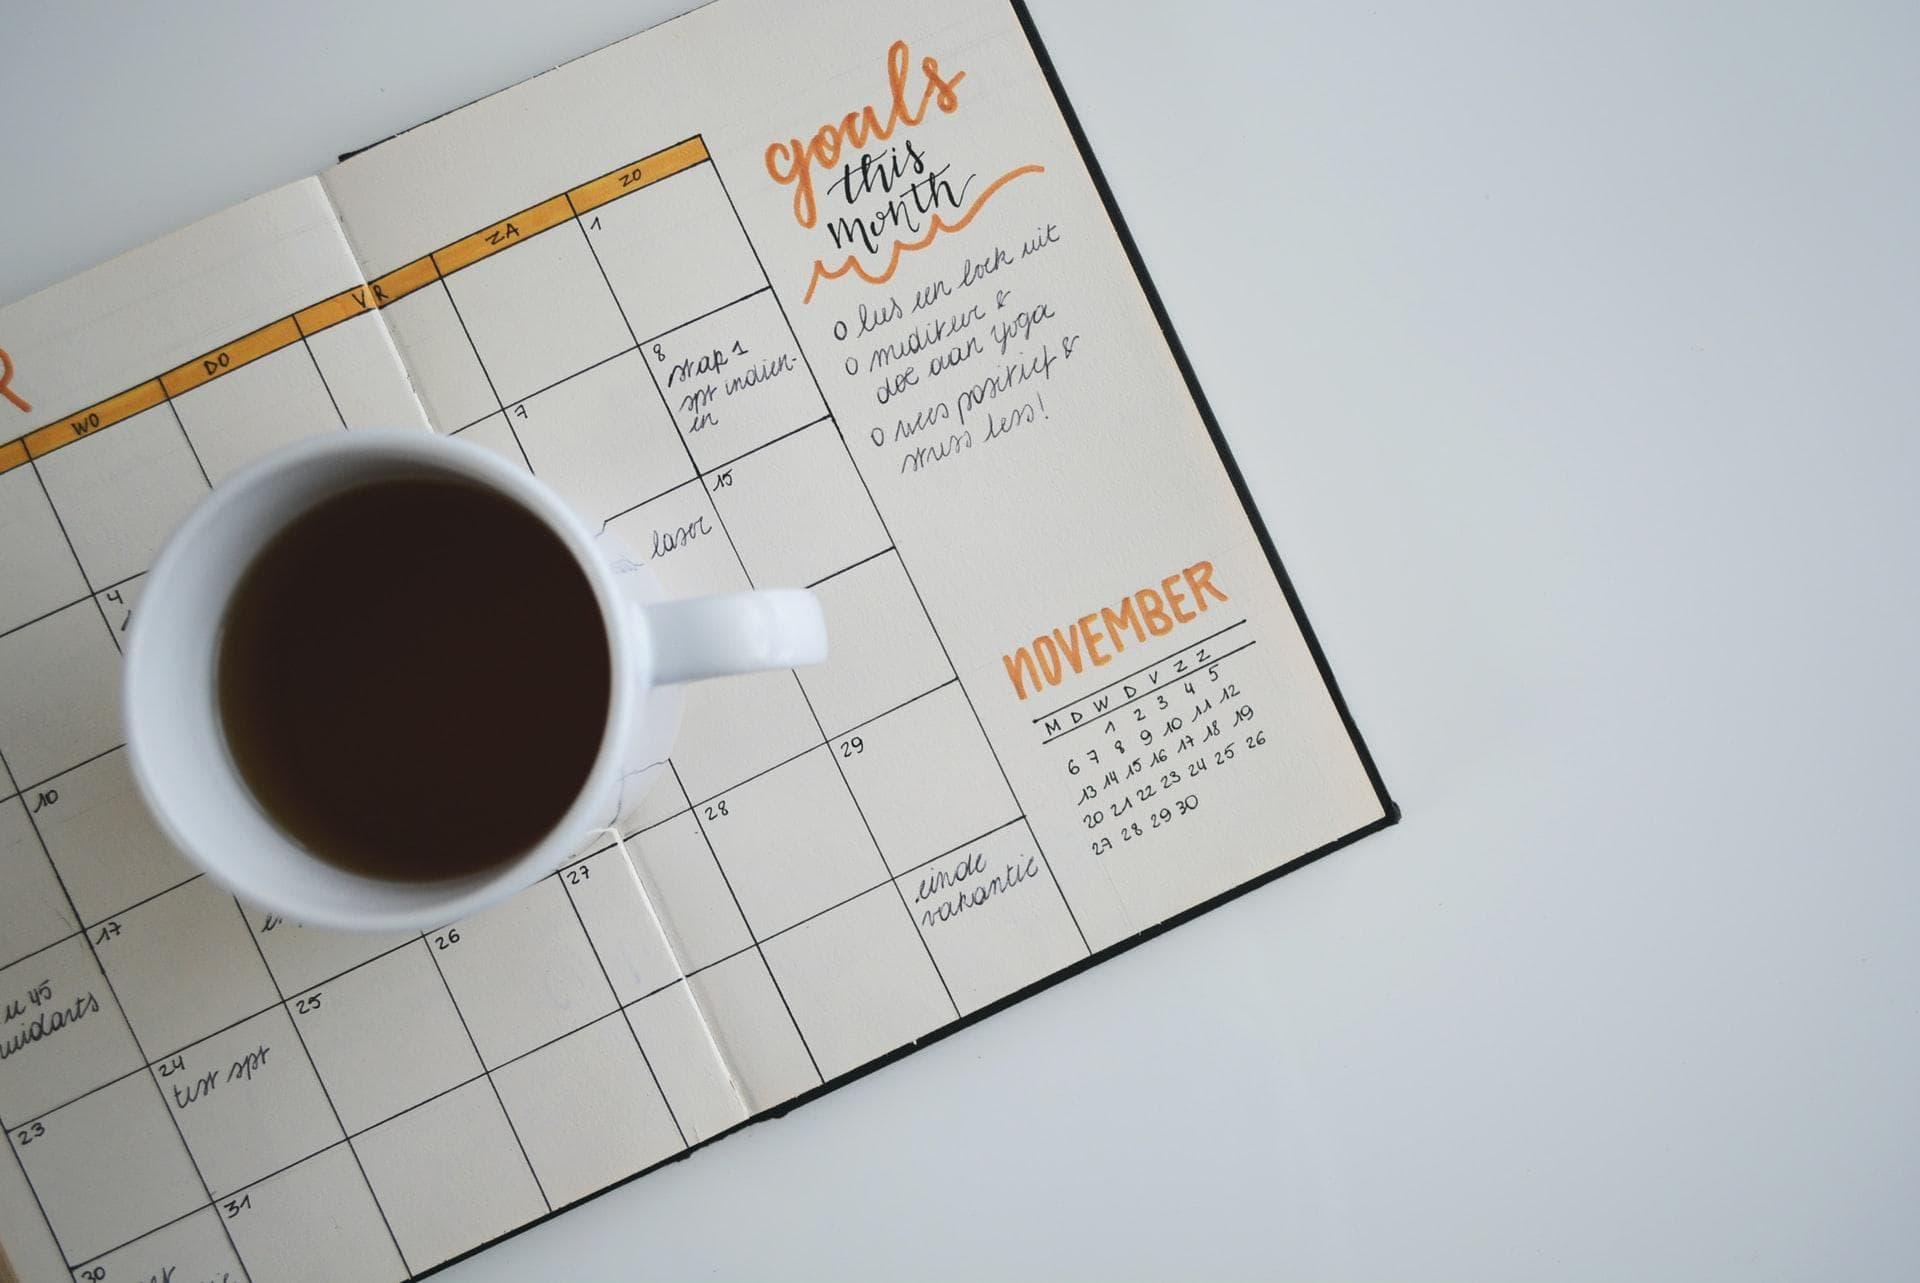 Coffee mug on calendar